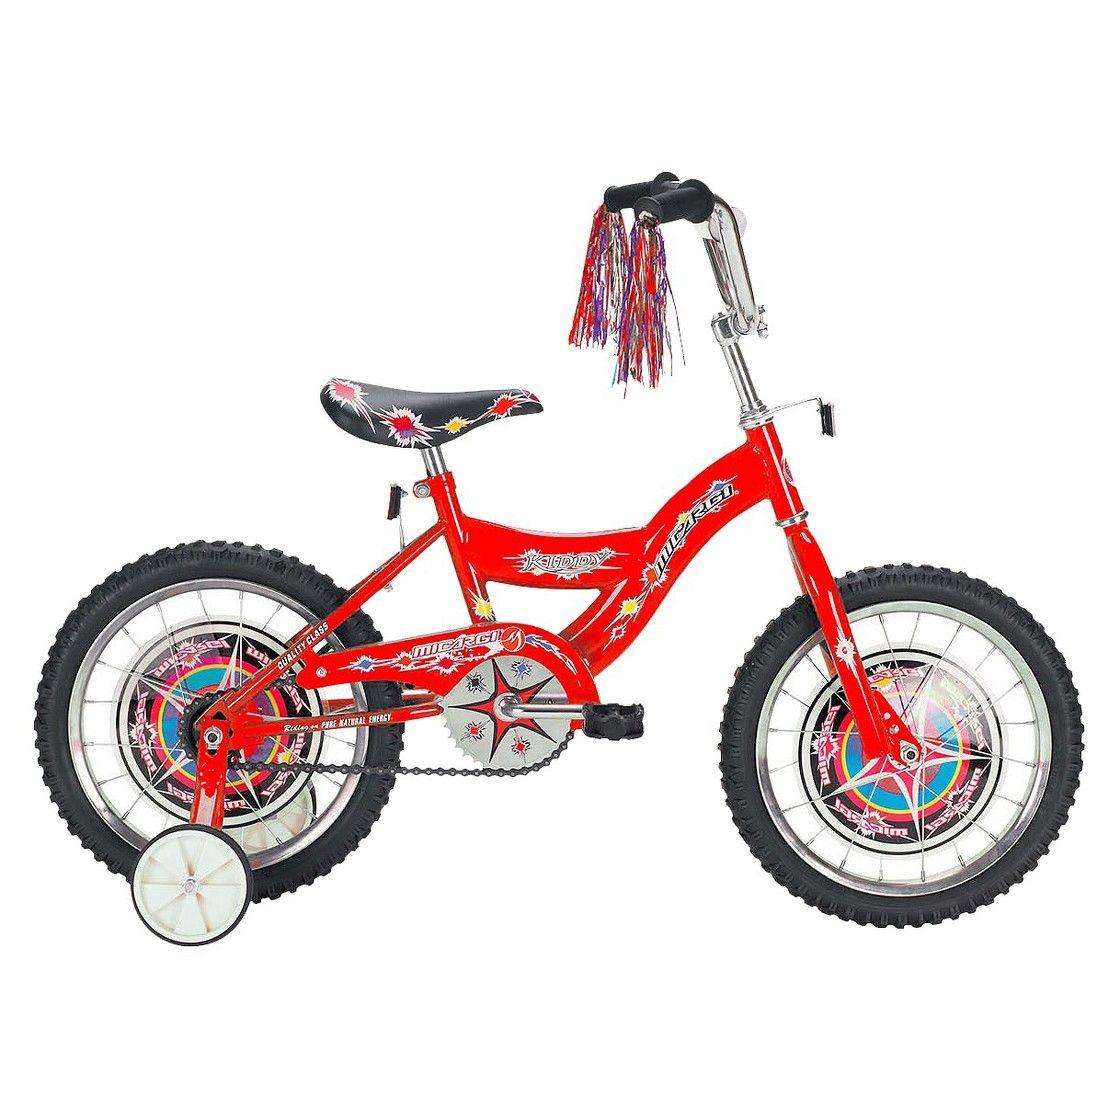 Micarge Kiddy Bmx bikes, Bike with training wheels, Bmx